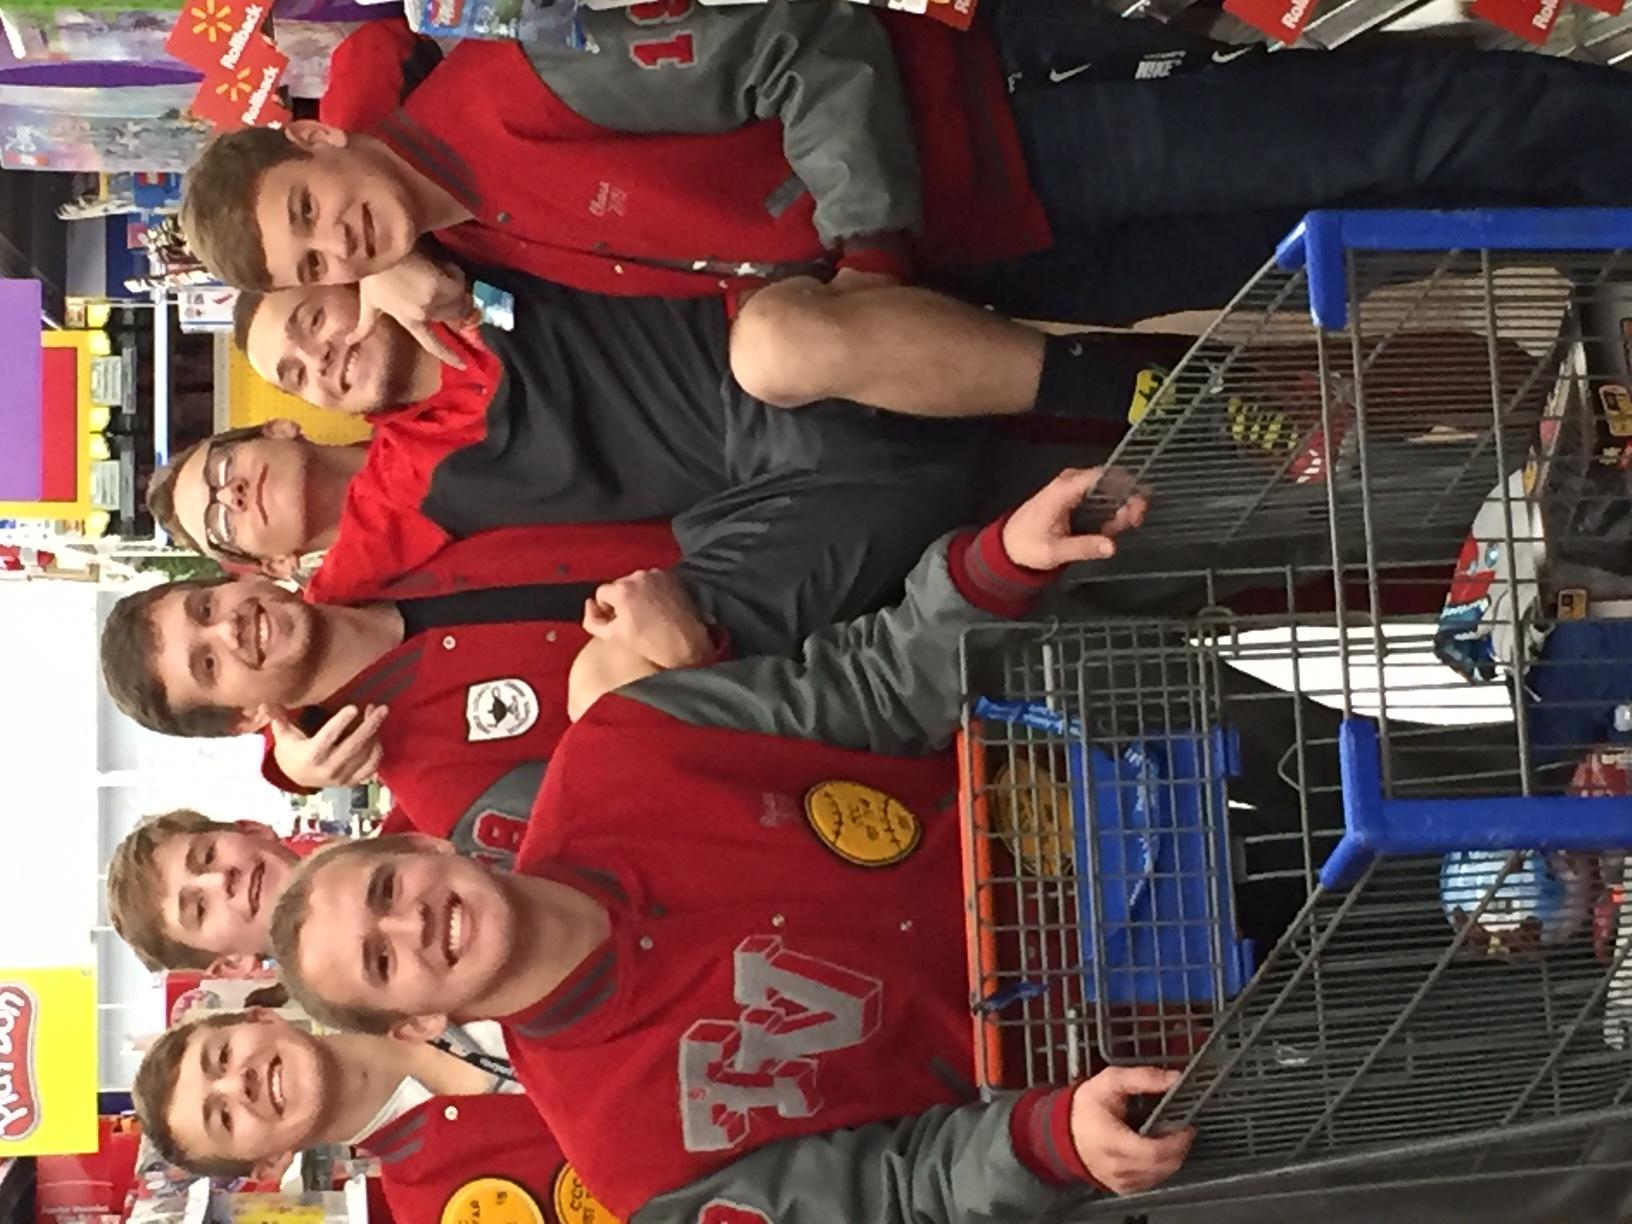 NHS Guys Shopping at Walmart